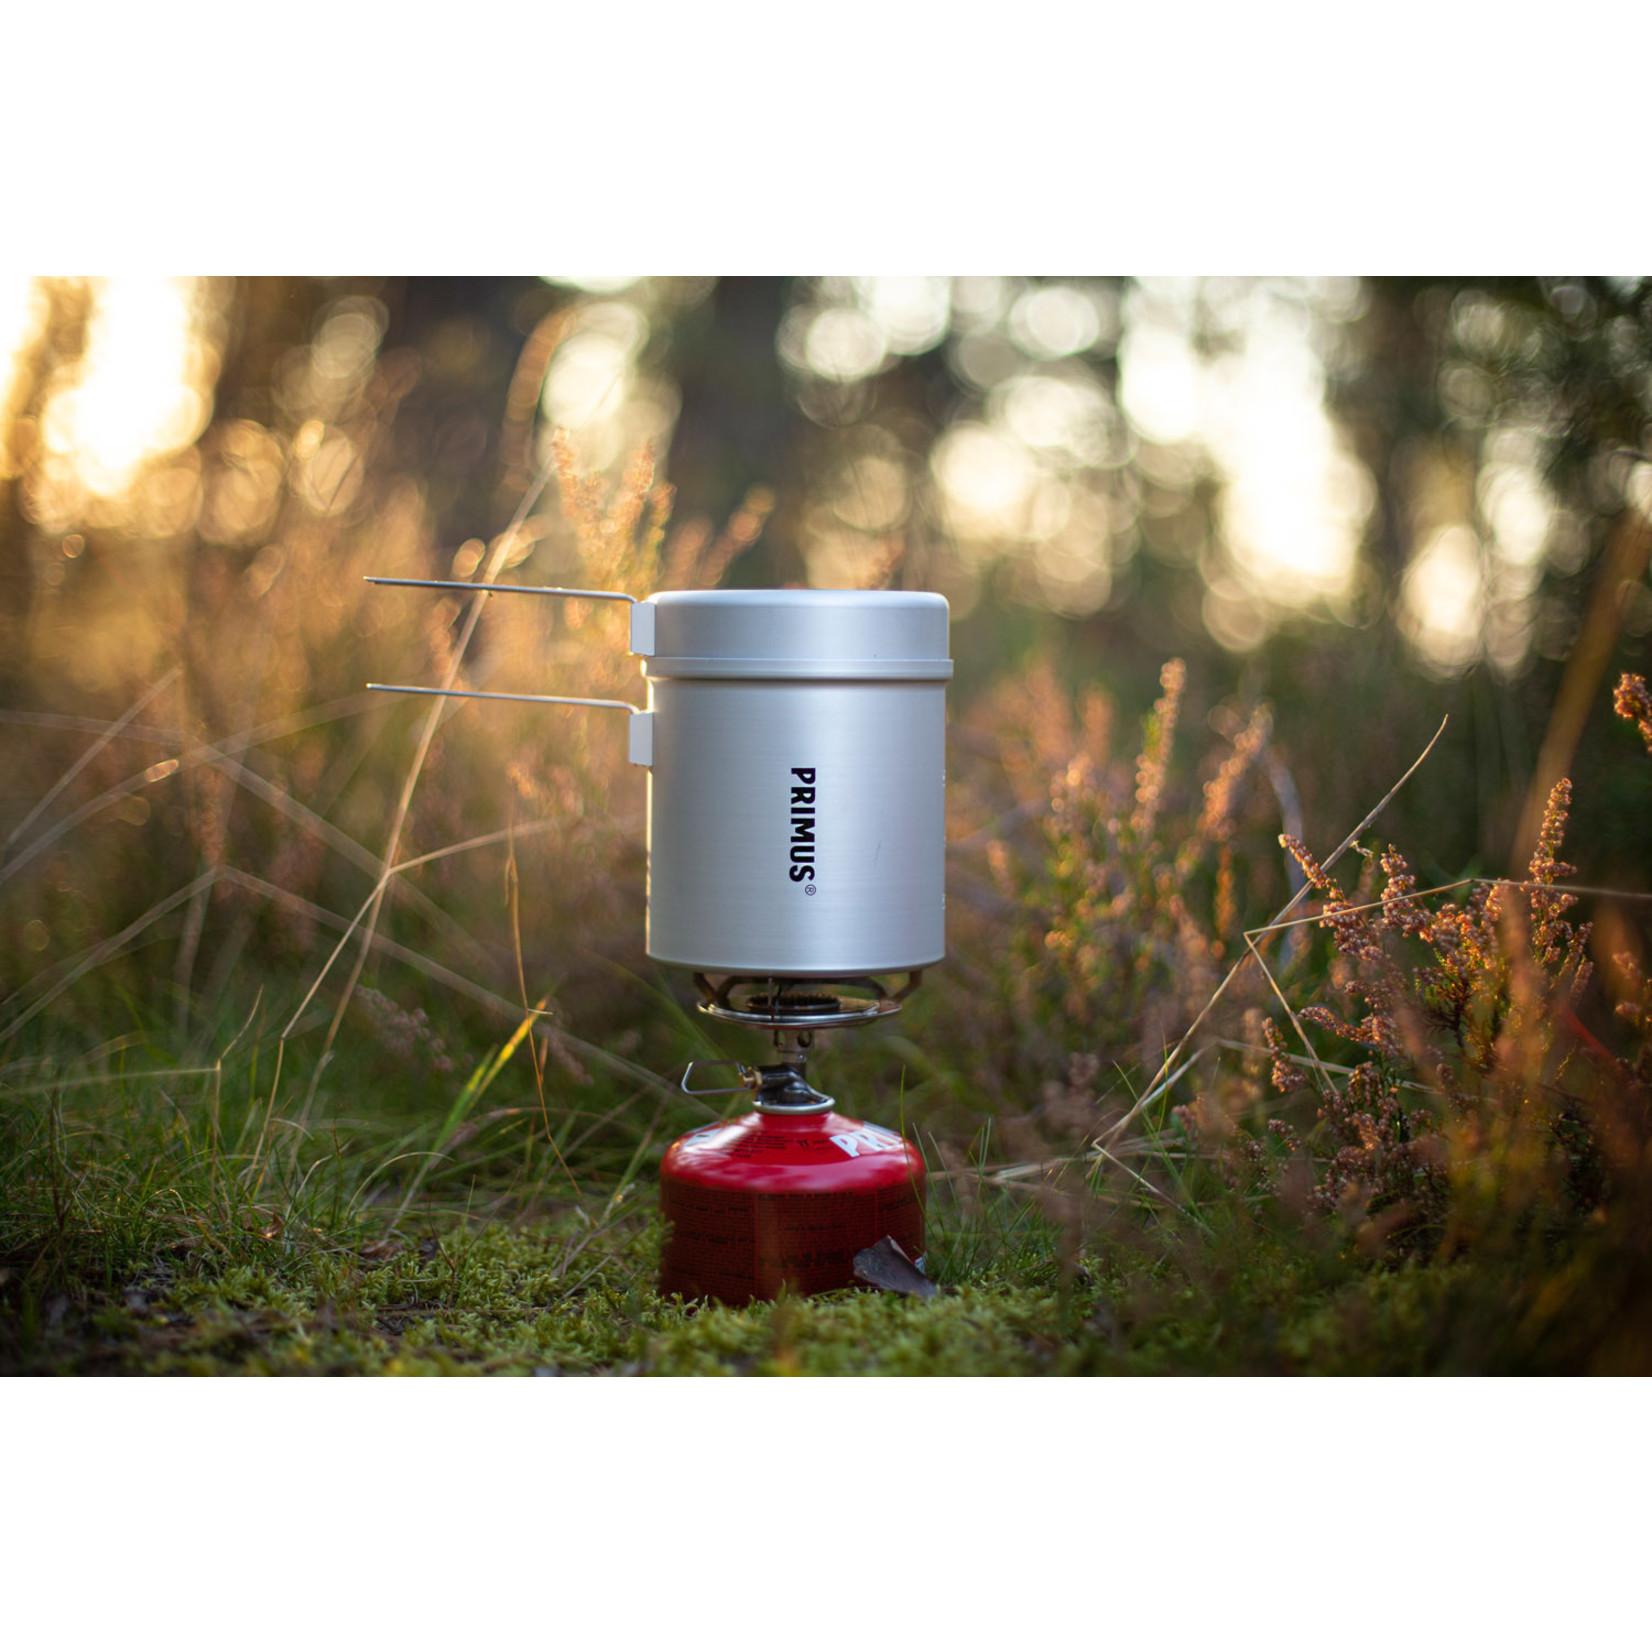 Primus Primus Essential Trail set 1 liter, Laminar Flow Burner-technologie